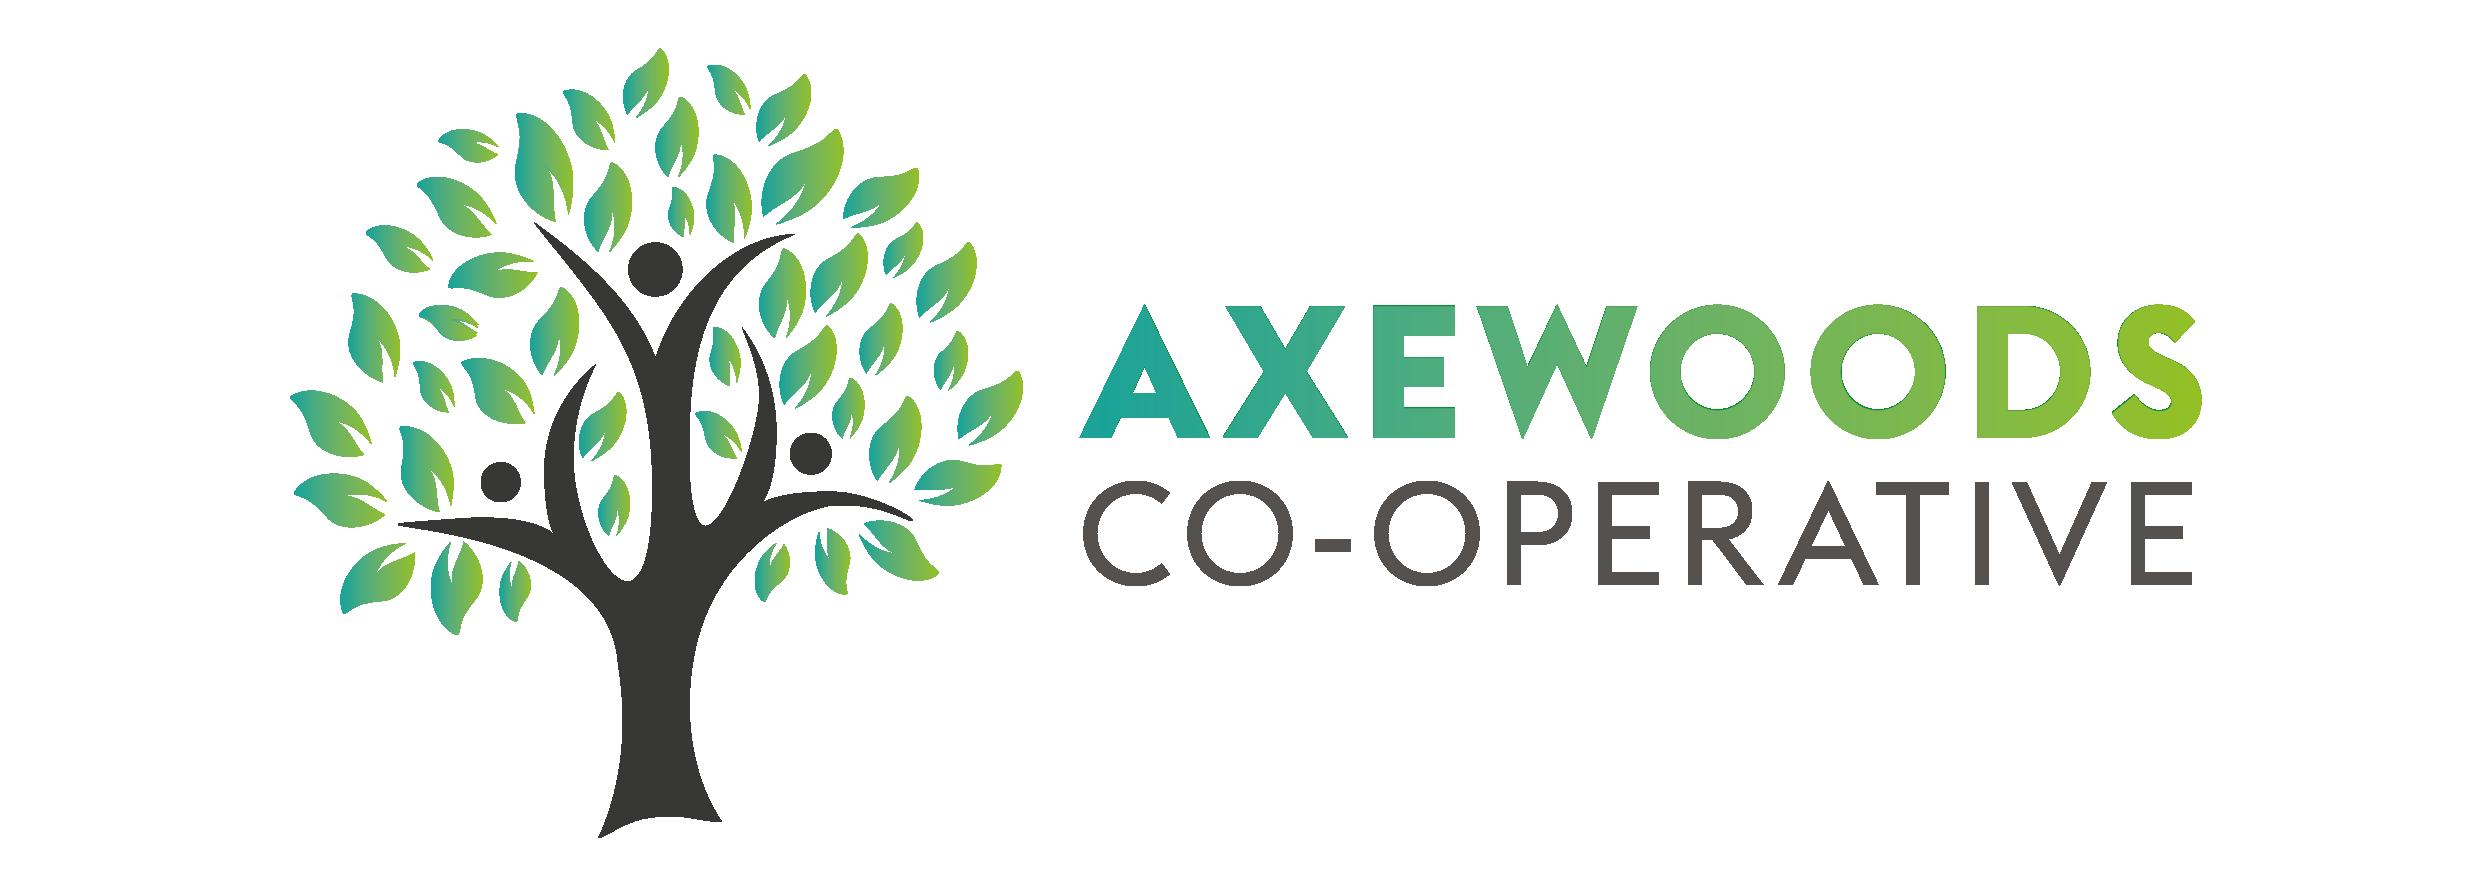 Axewoods